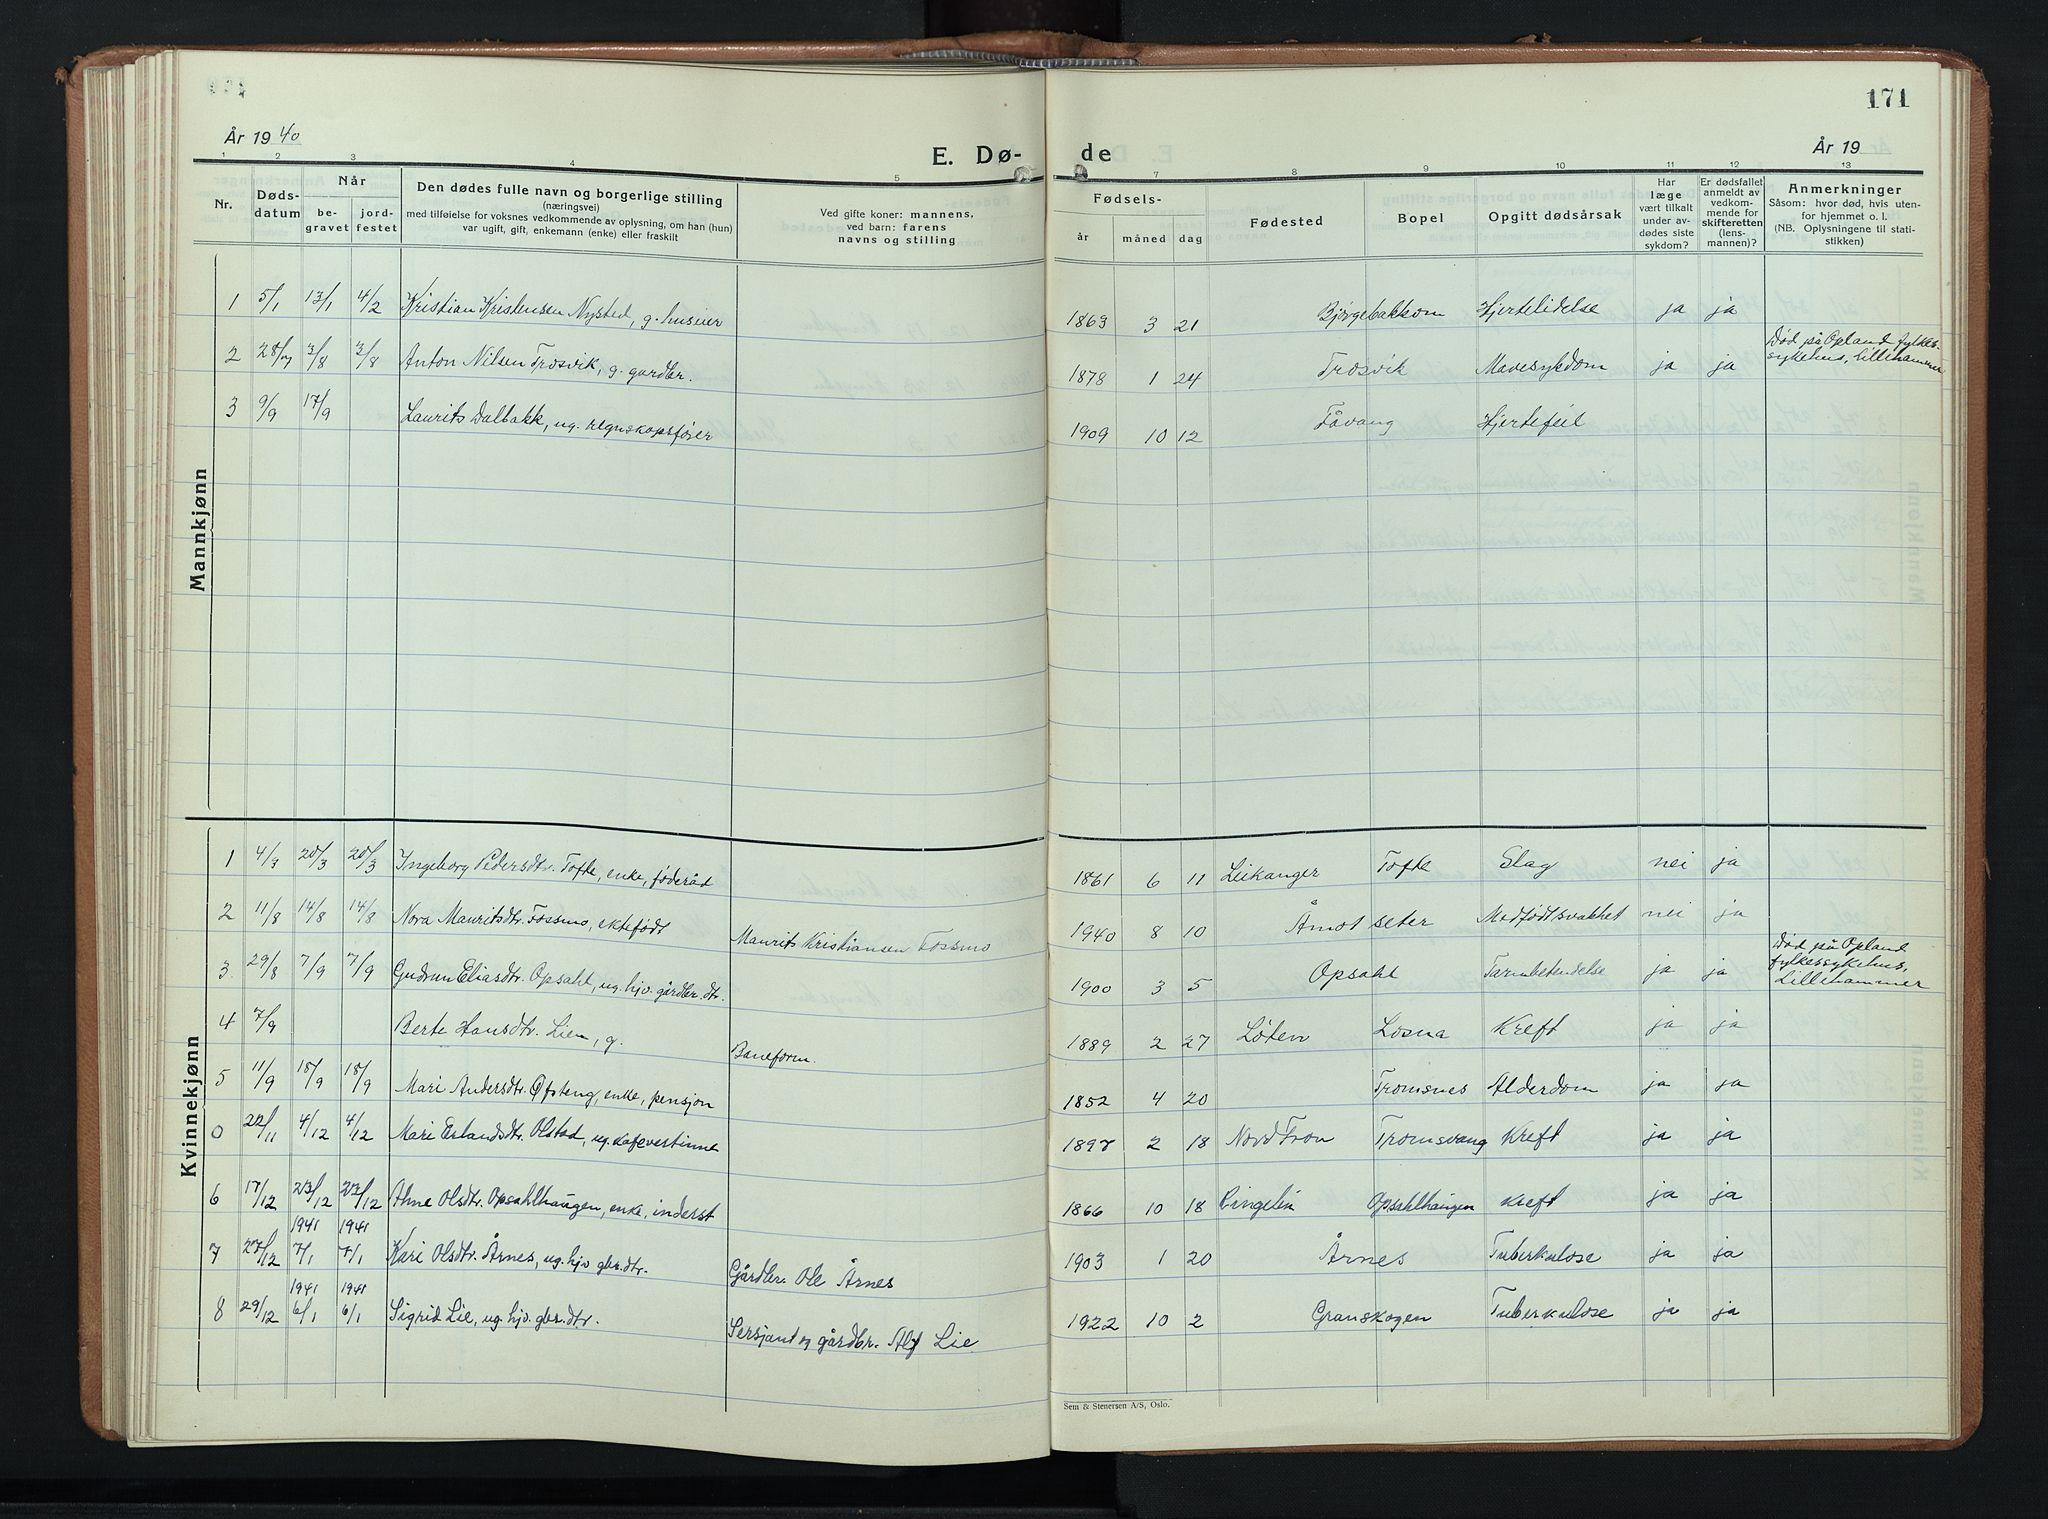 SAH, Ringebu prestekontor, Klokkerbok nr. 12, 1934-1949, s. 171